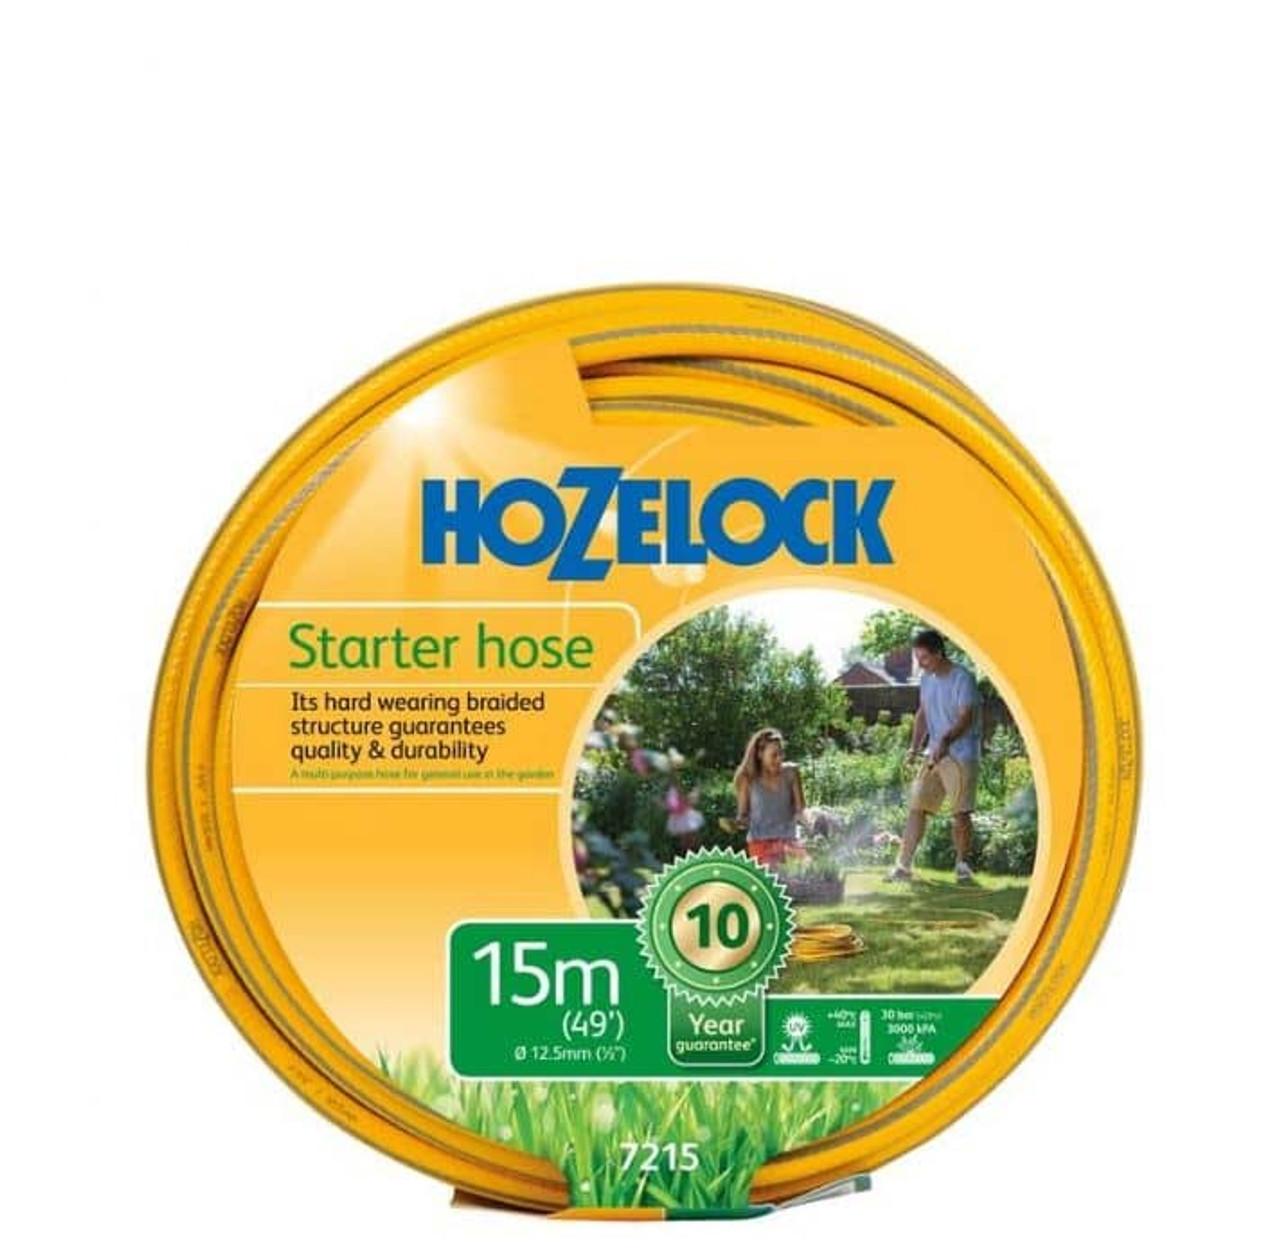 Hozelock 7215 15m Starter Hose